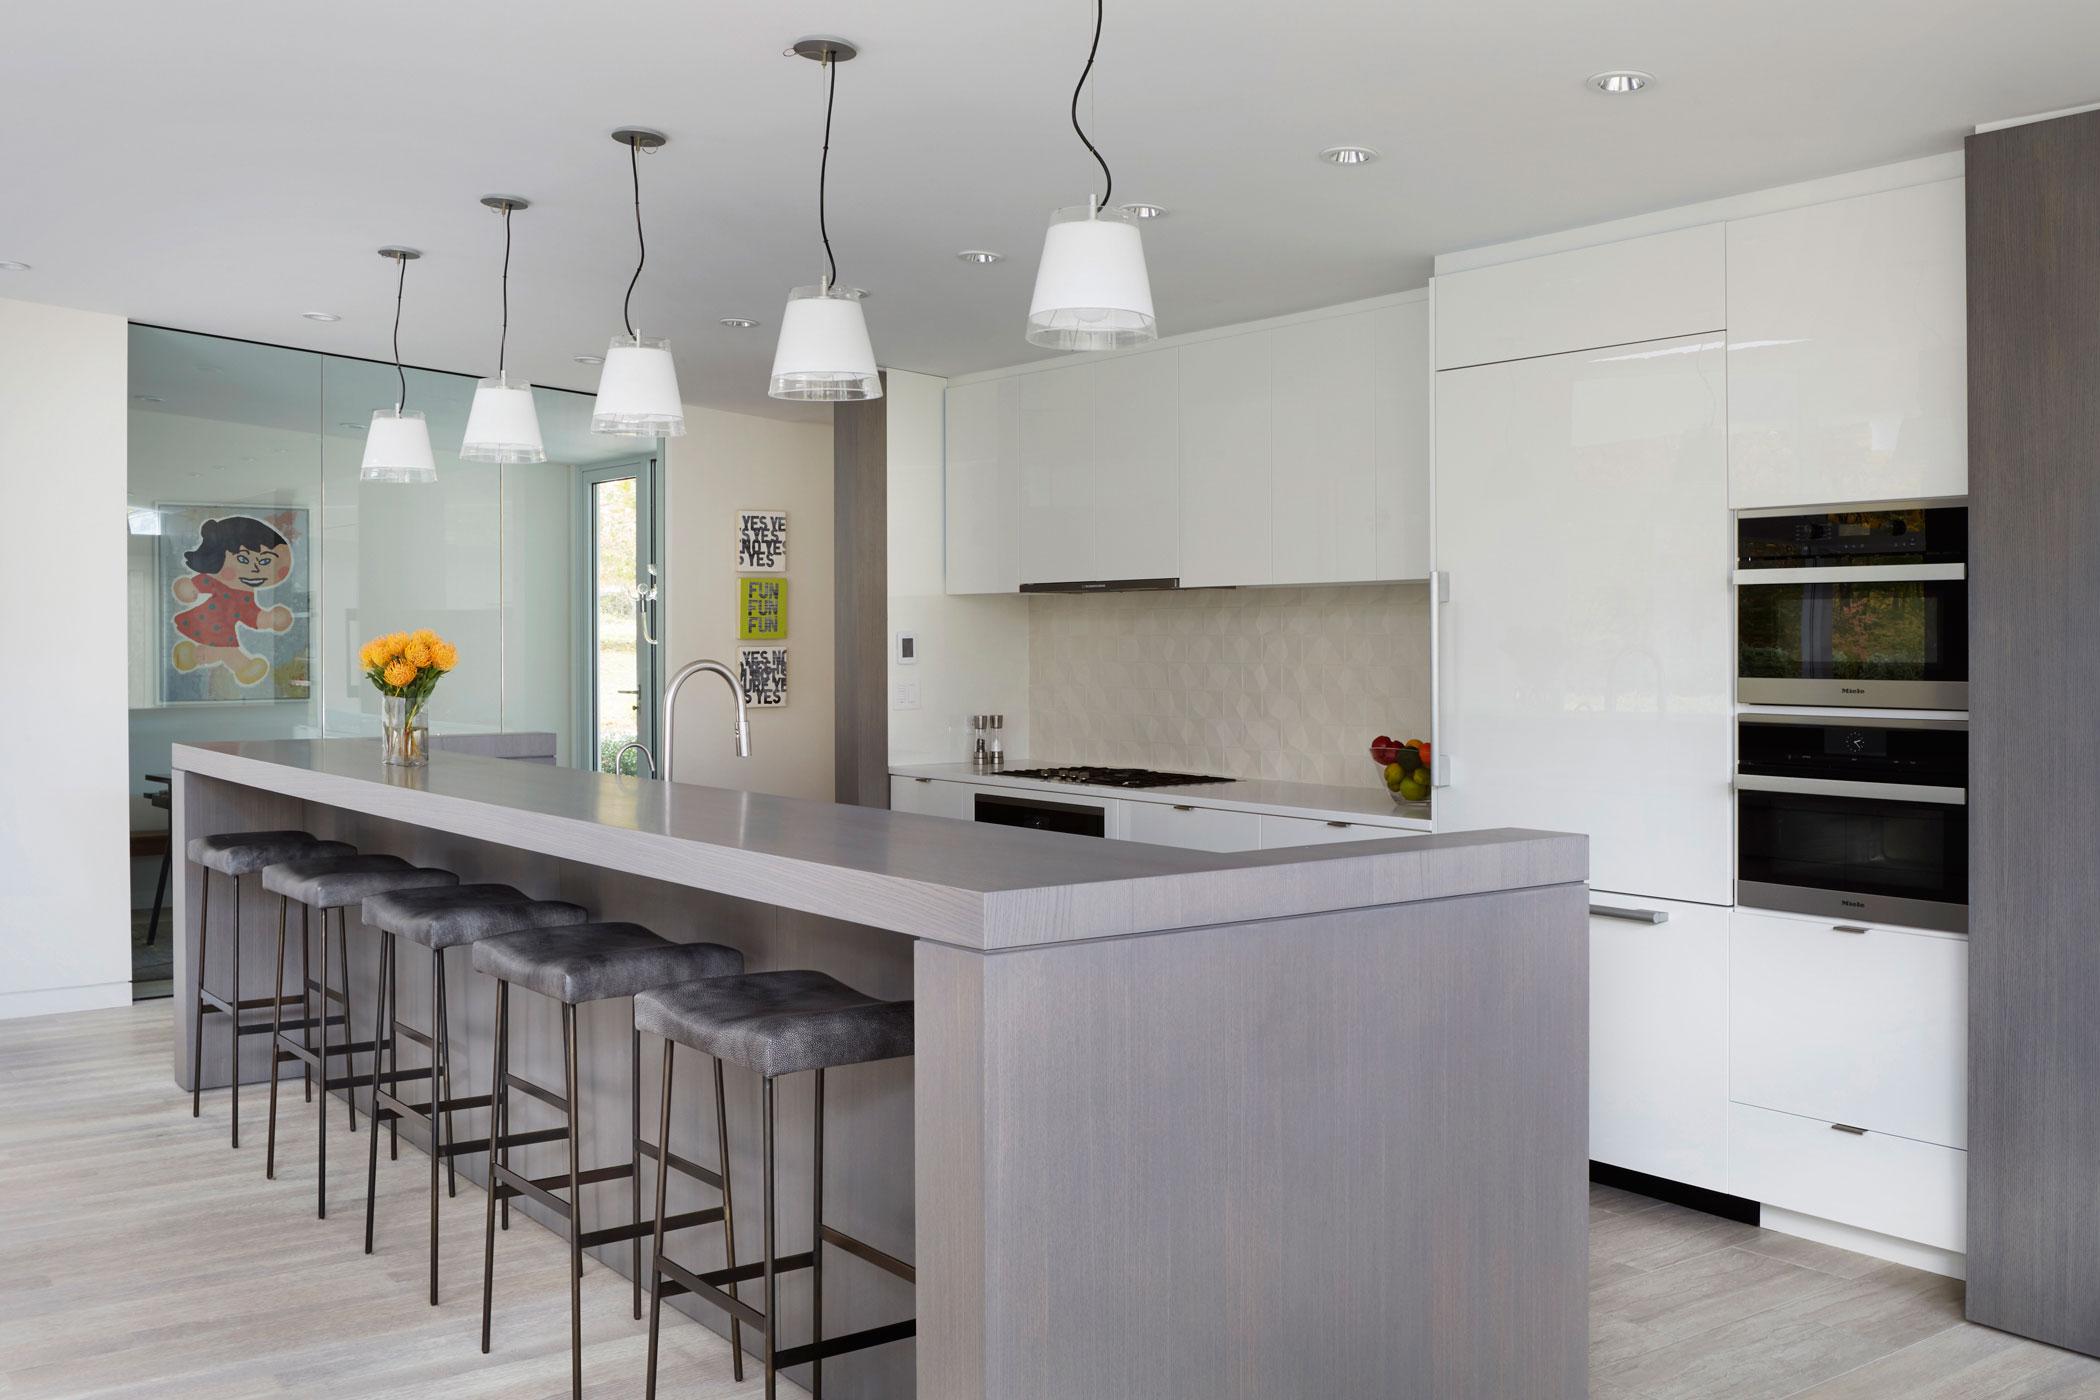 Kitchen Island - Mid-century Modern House